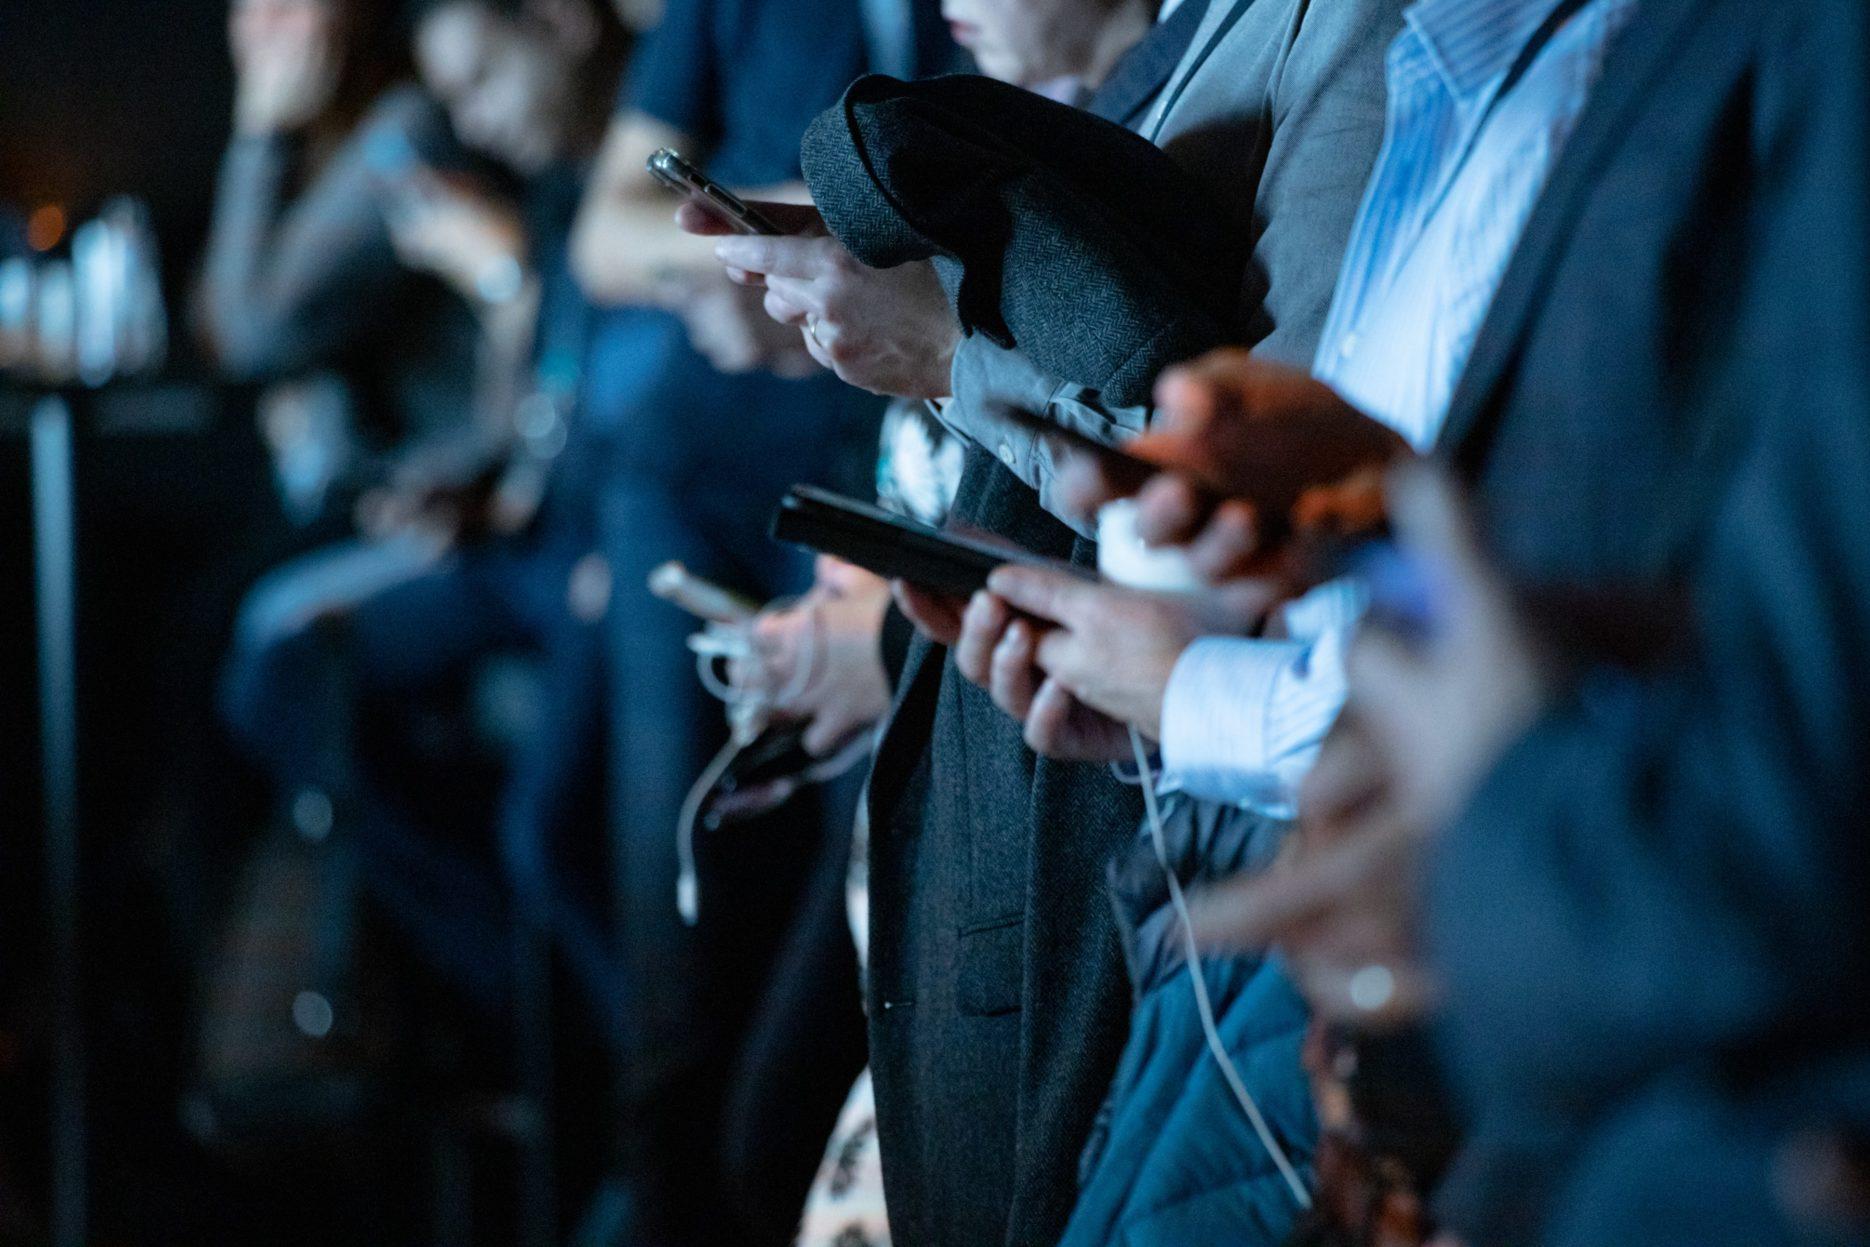 Users look at mobile phones. Credit: Unsplash